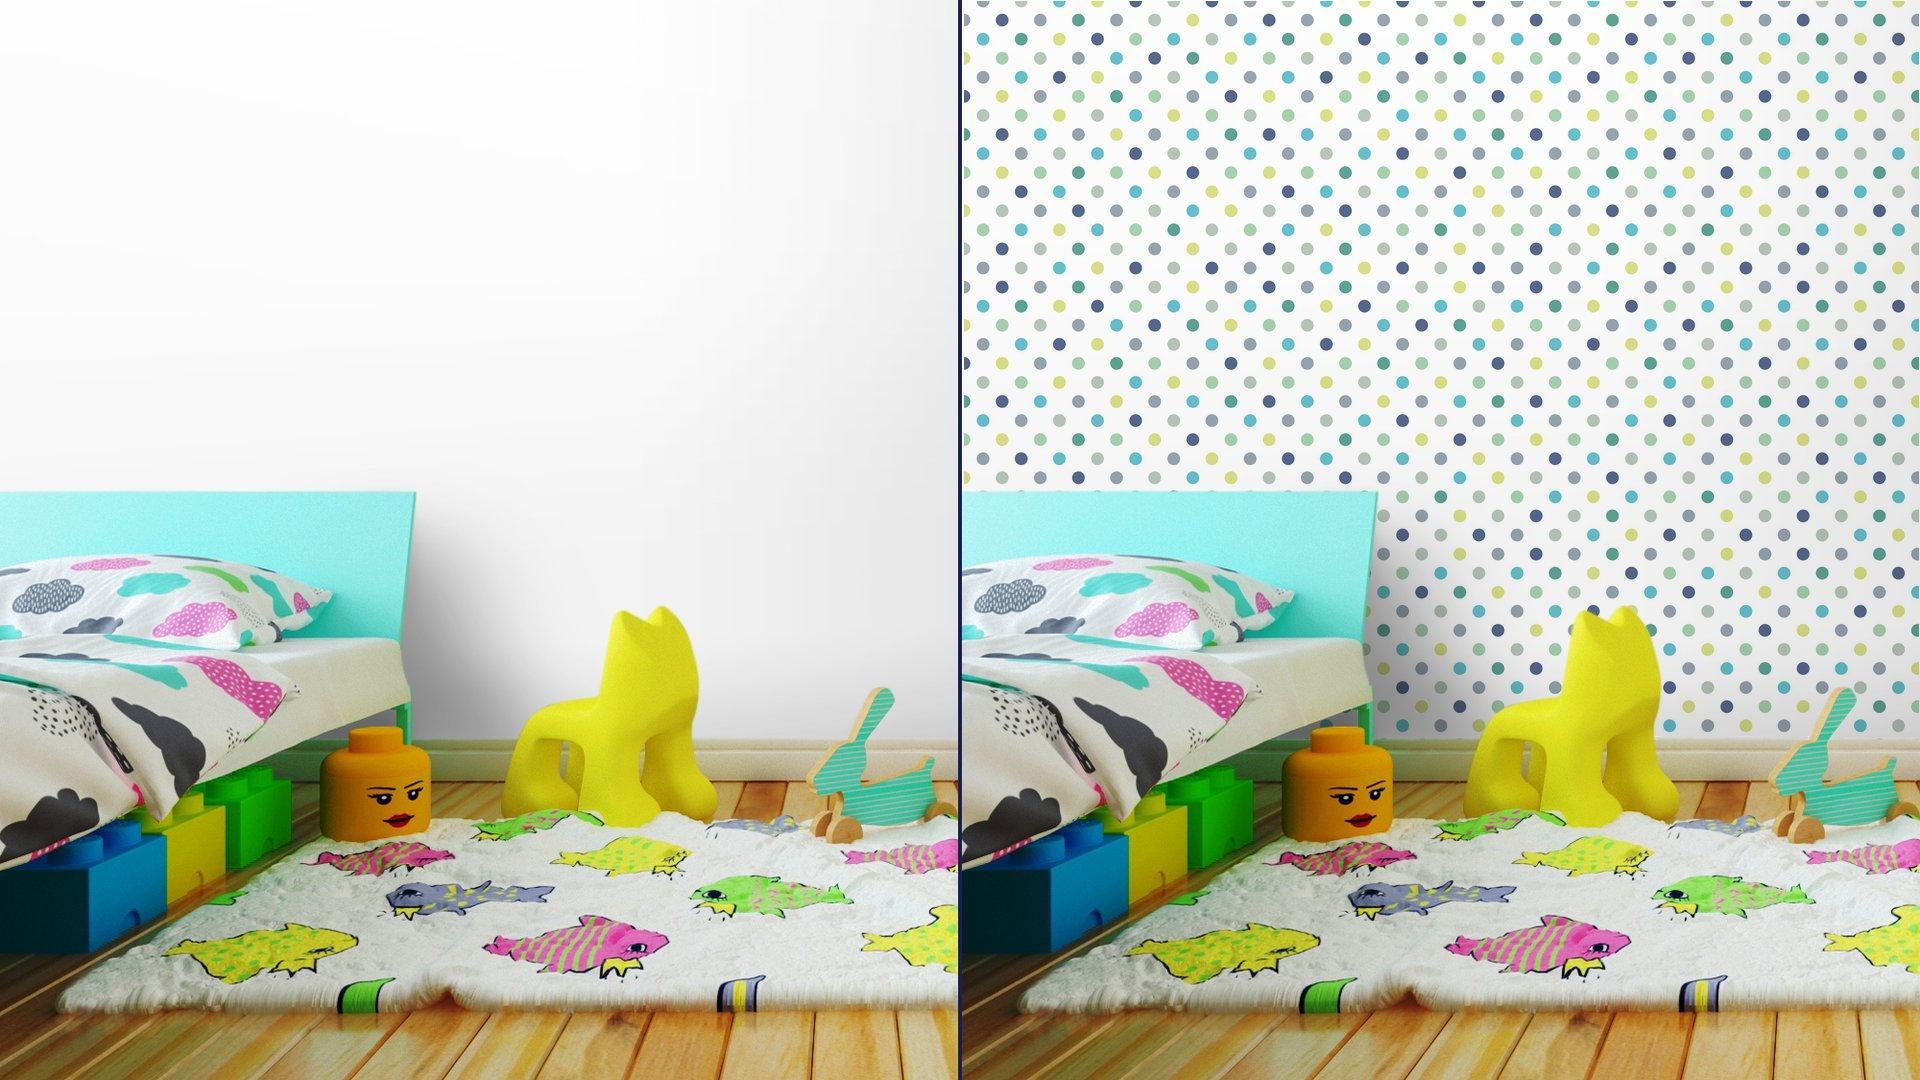 Fotomurales mexico papeles pintados lavables puntos vector patron de fondo sin fisuras lunares de colores 4 - Papel Tapiz Lunares de Colores Fondo Blanco 01